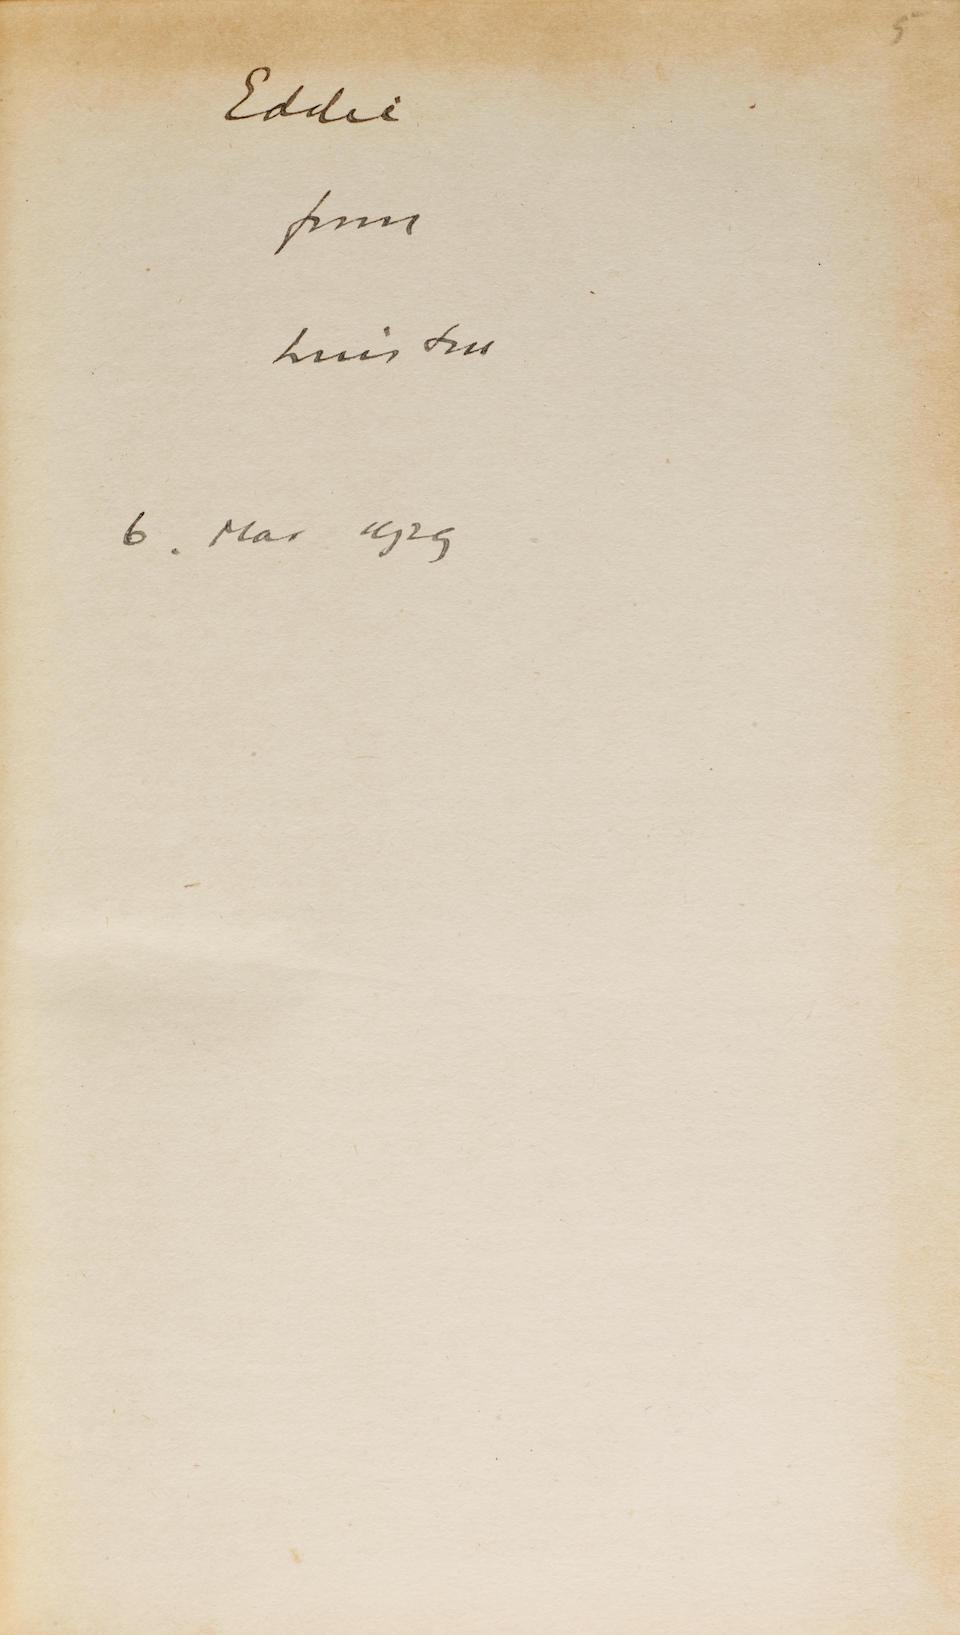 CHURCHILL, WINSTON SPENCER. 1874-1965. The World Crisis. London: Thornton Butterworth Limited, 1923-1931.